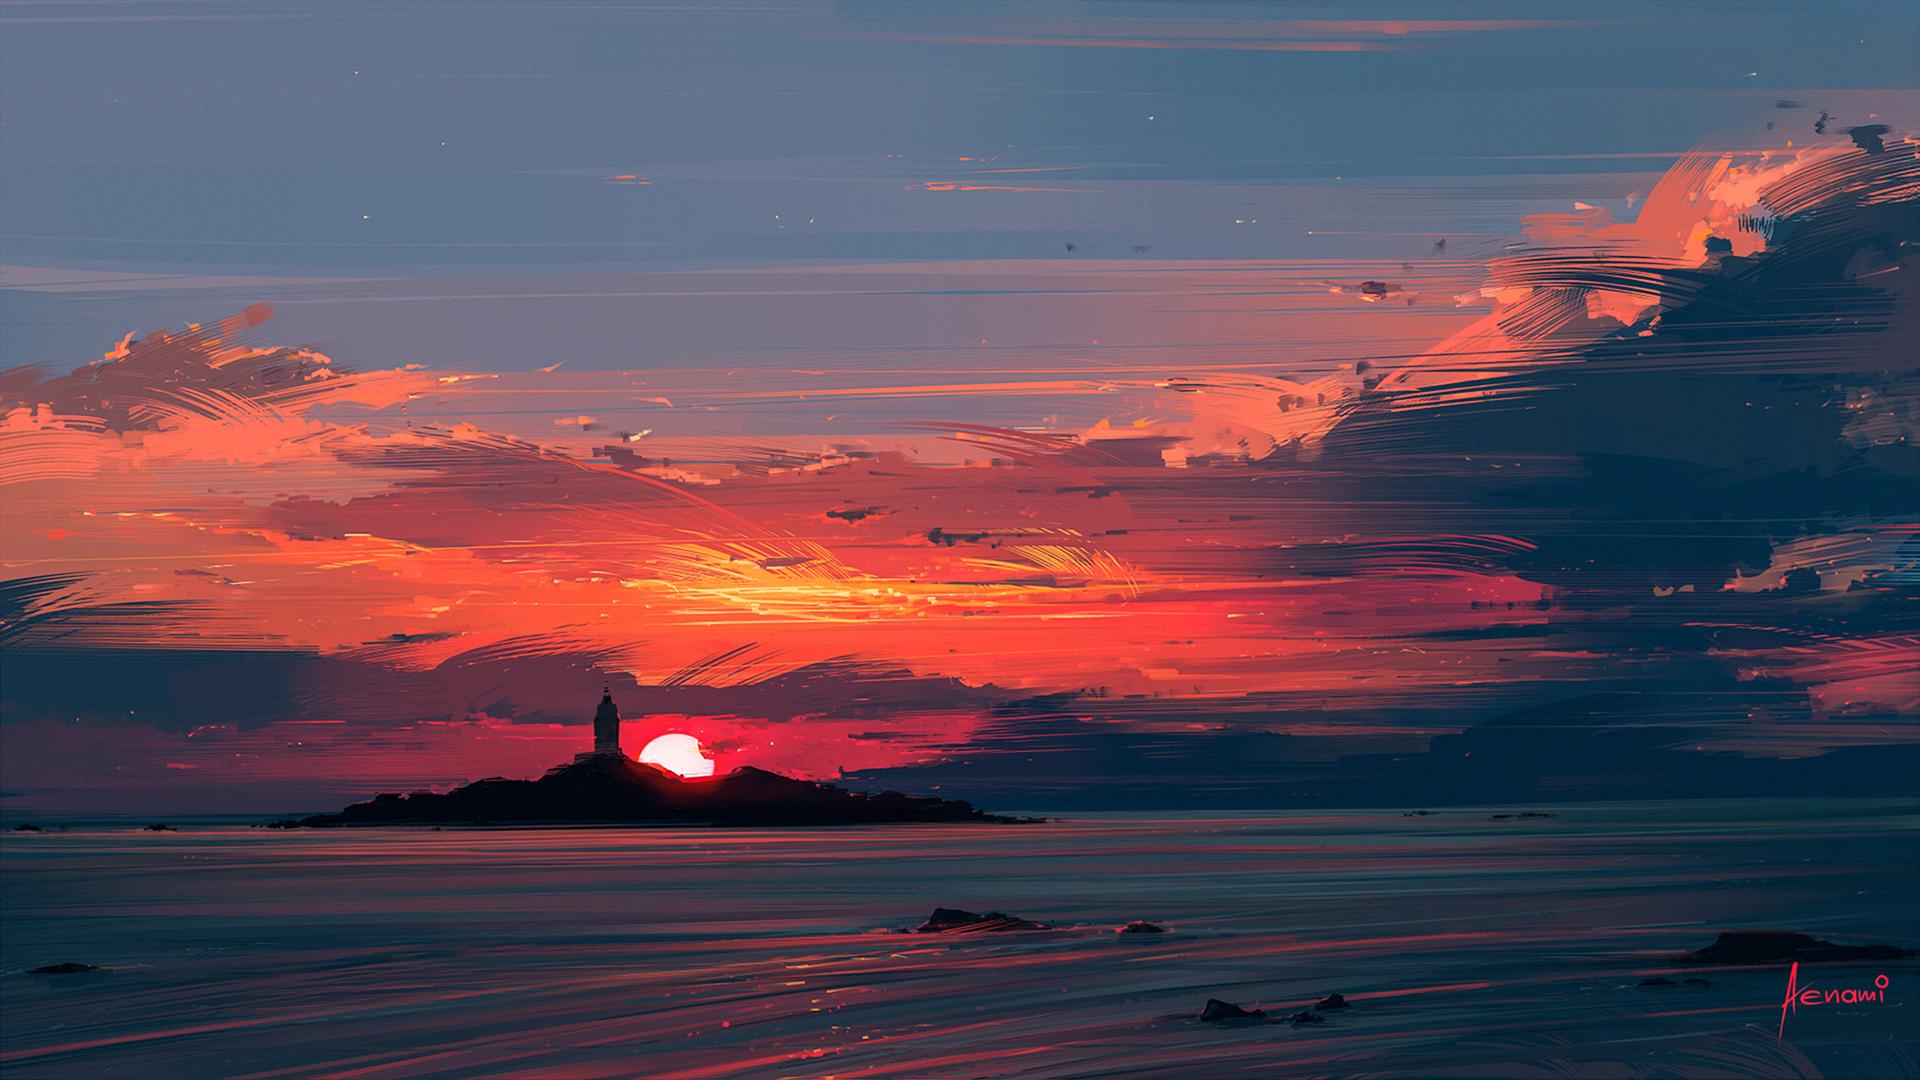 General 1920x1080 sunset water illustration Aenami artwork digital art sea island